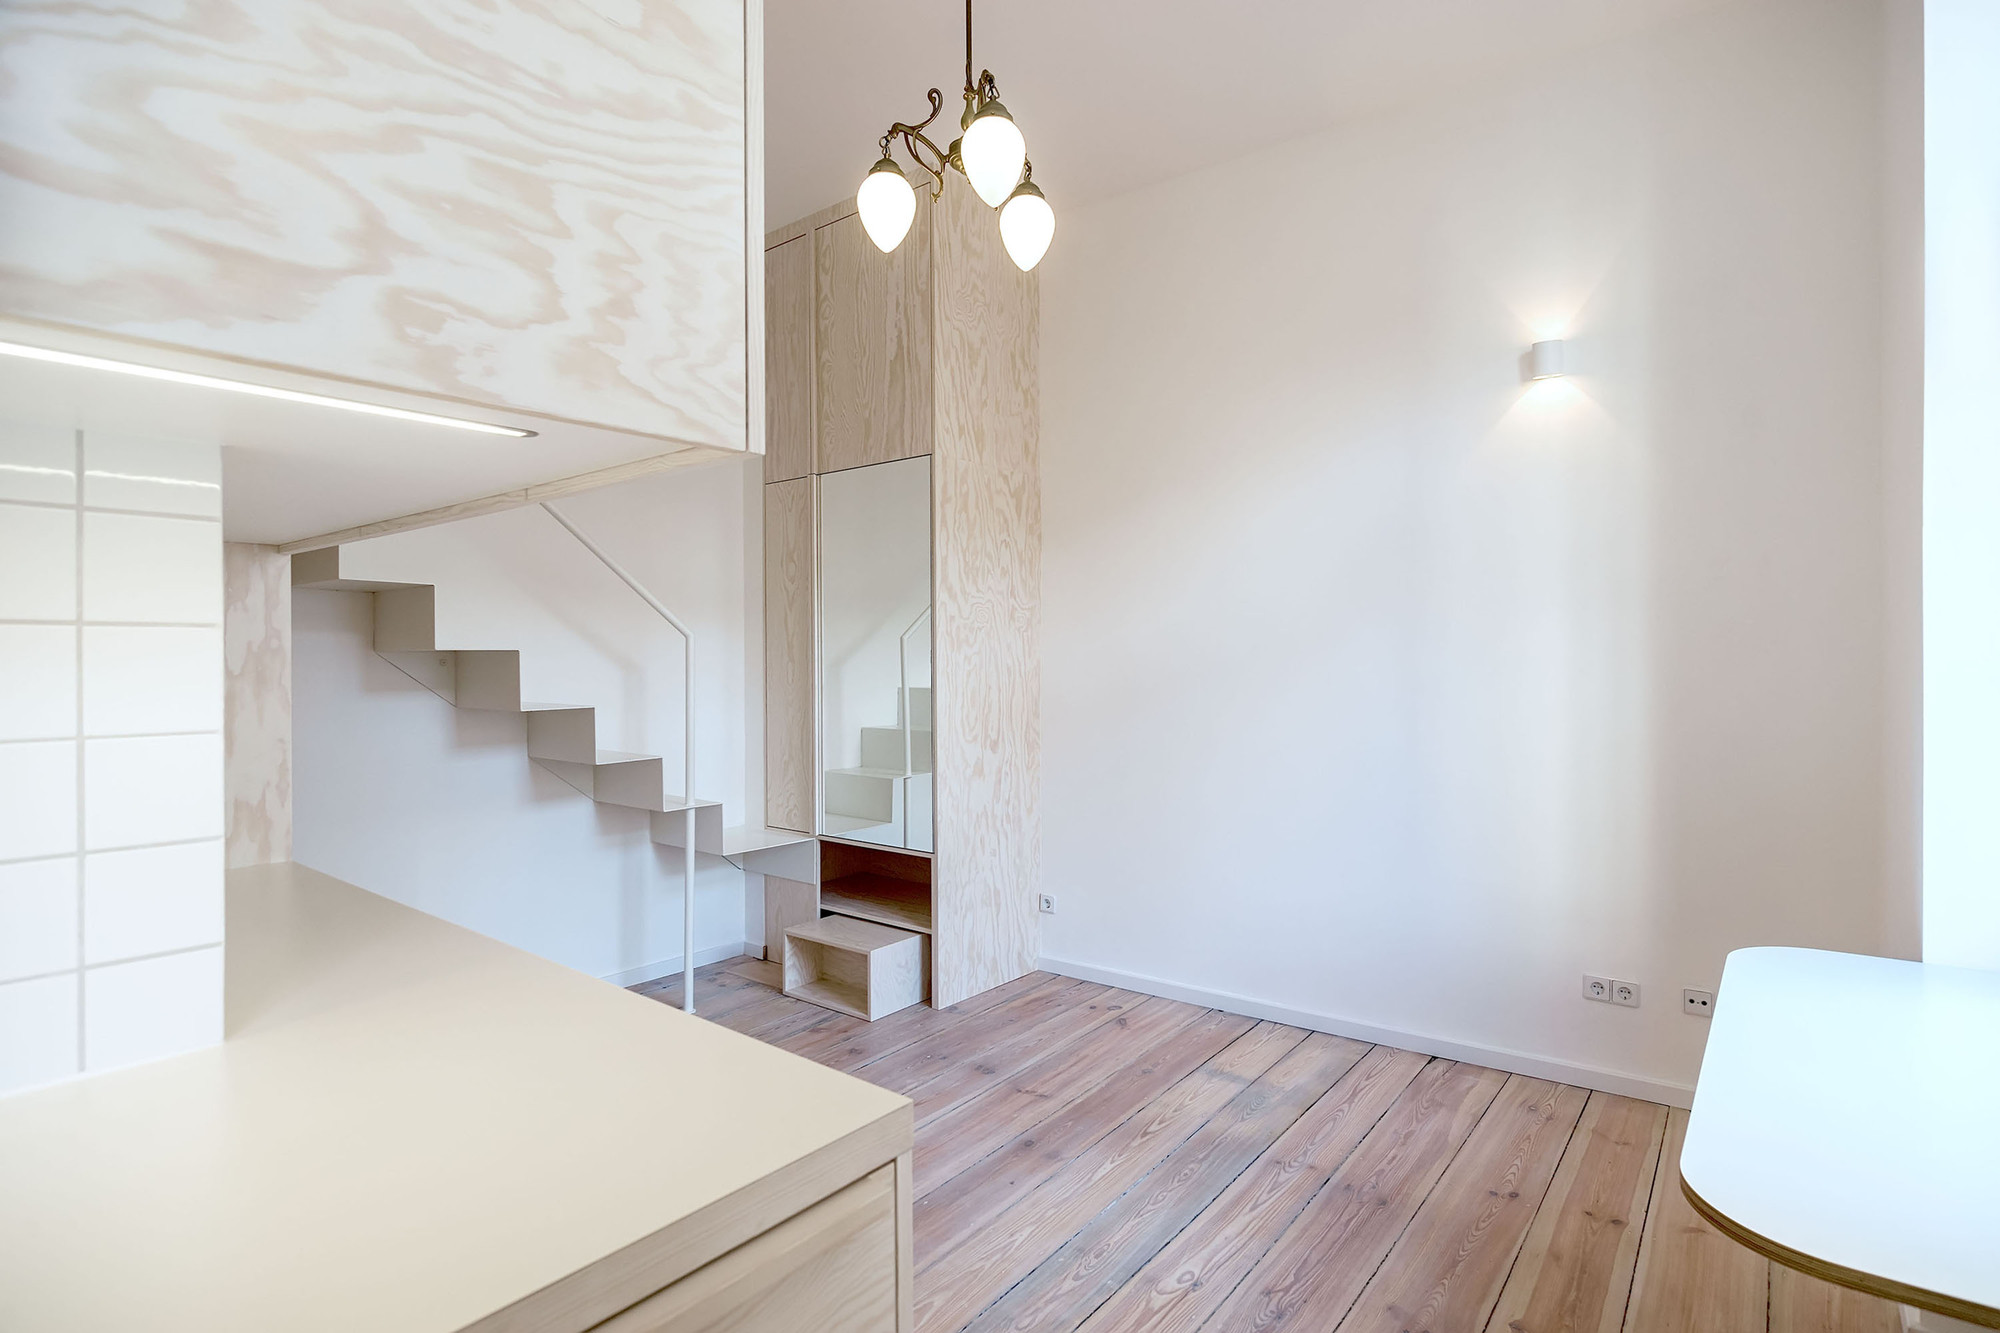 micro apartment in berlin 5 Micro apartment in Berlin